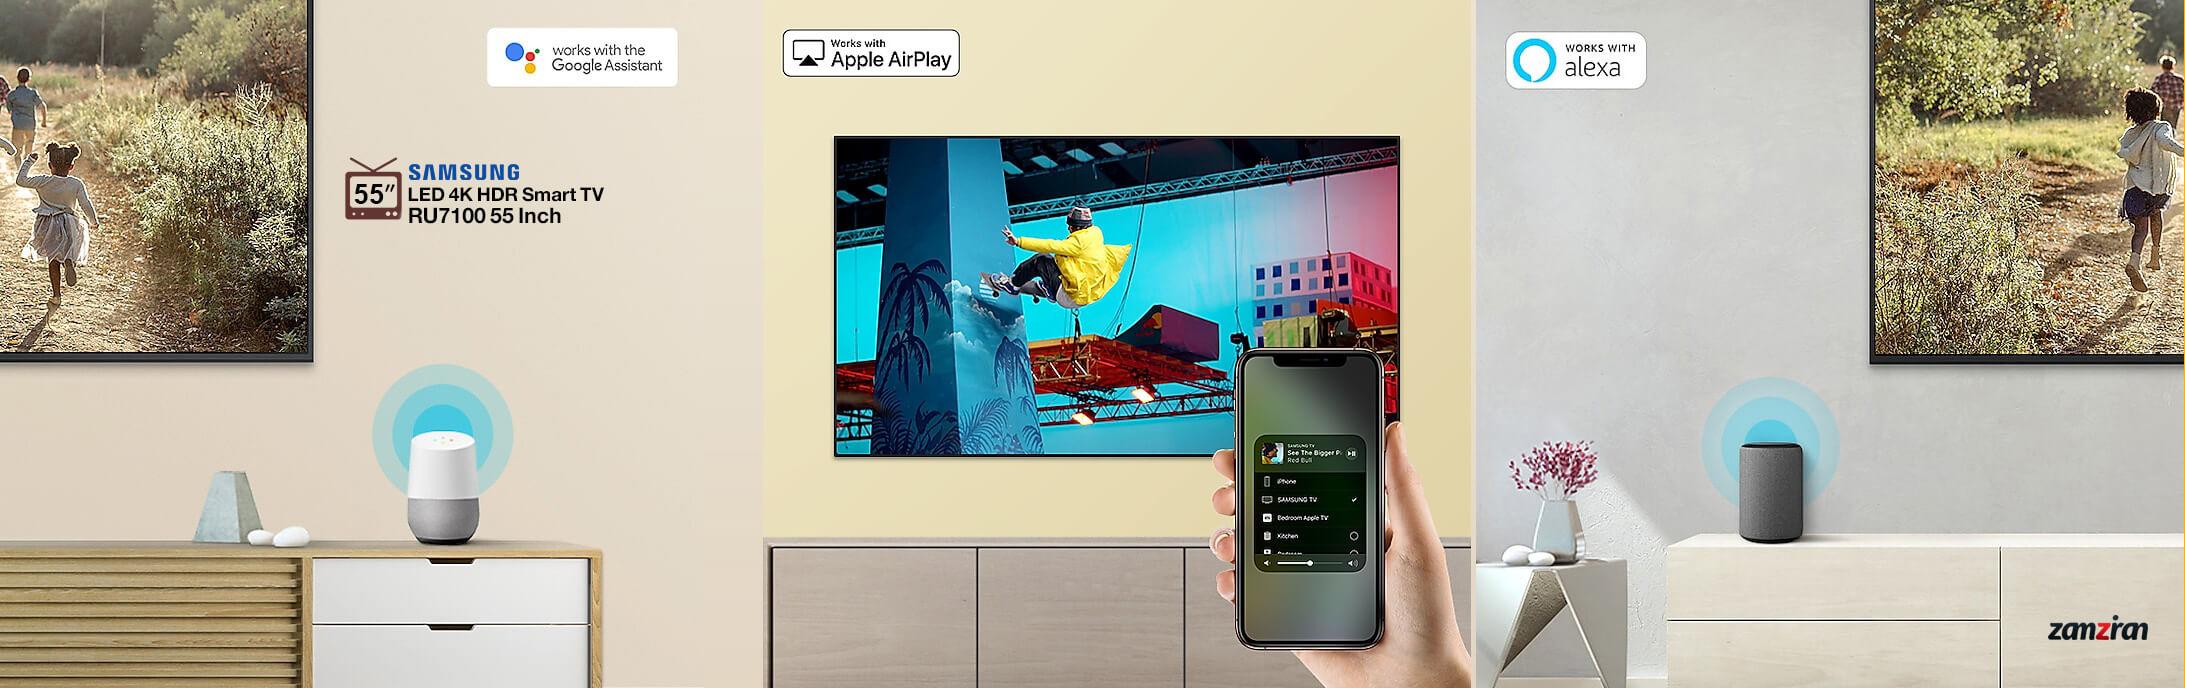 فناوری های هوشمند جدید تلویزیون سامسونگ RU7100